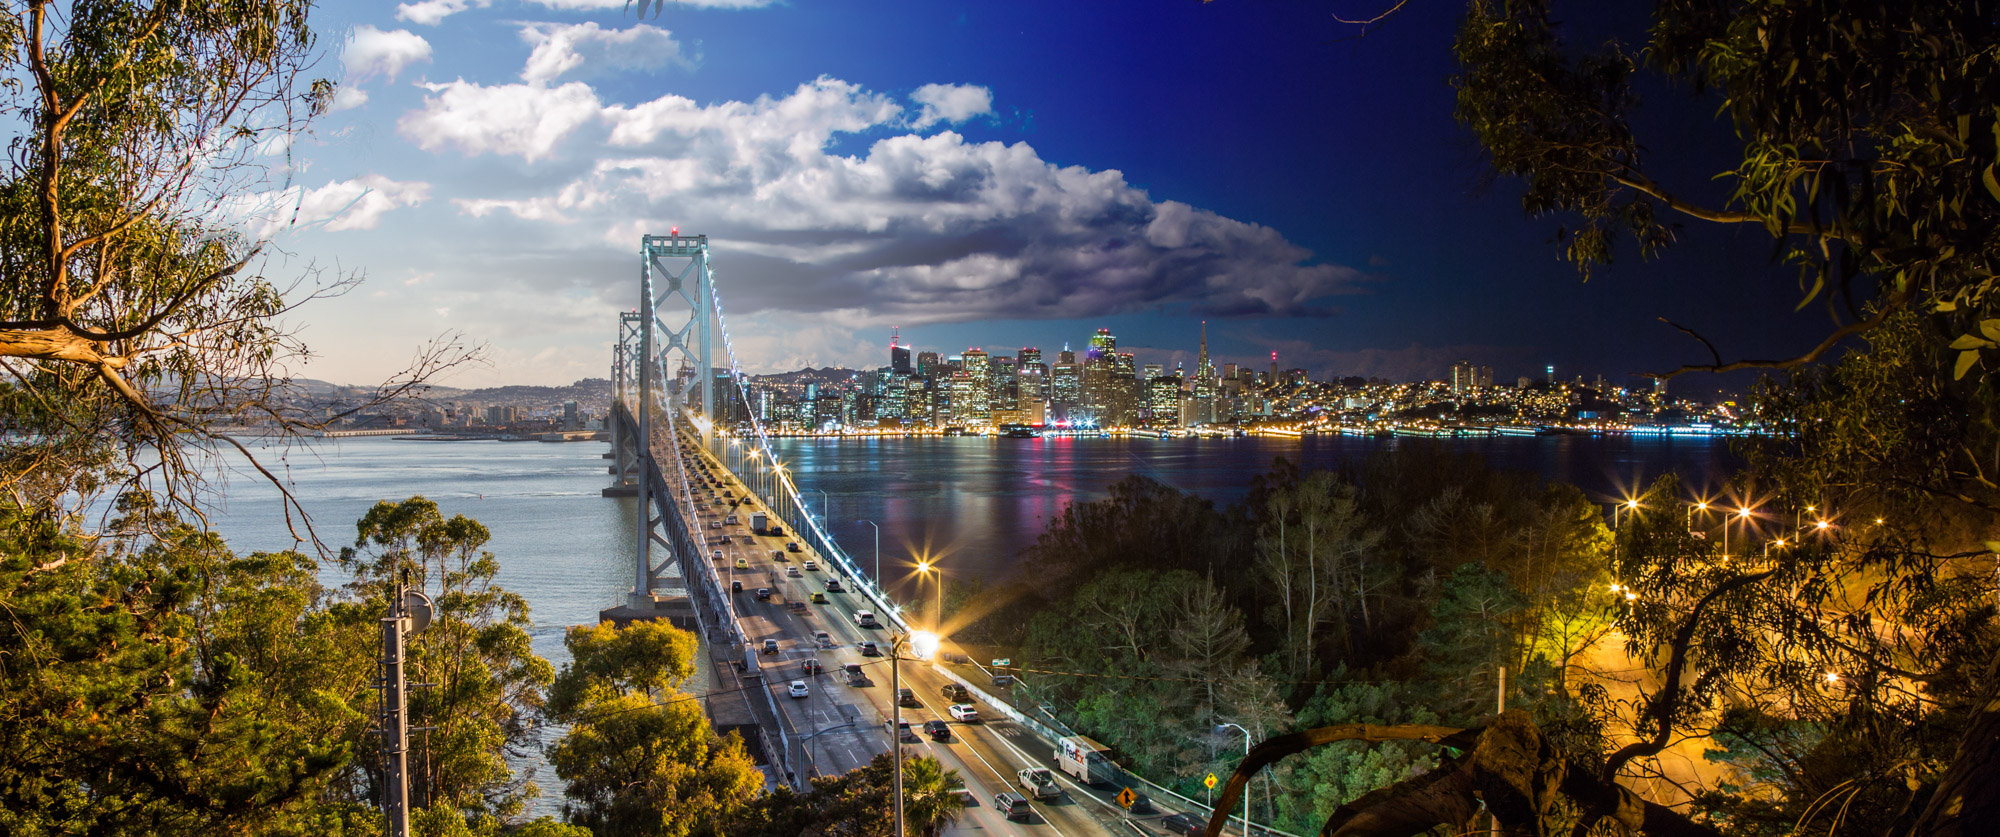 26-San_Francisco_Bay_Bridge_Day_Night_Timelapse_Yerba Buena